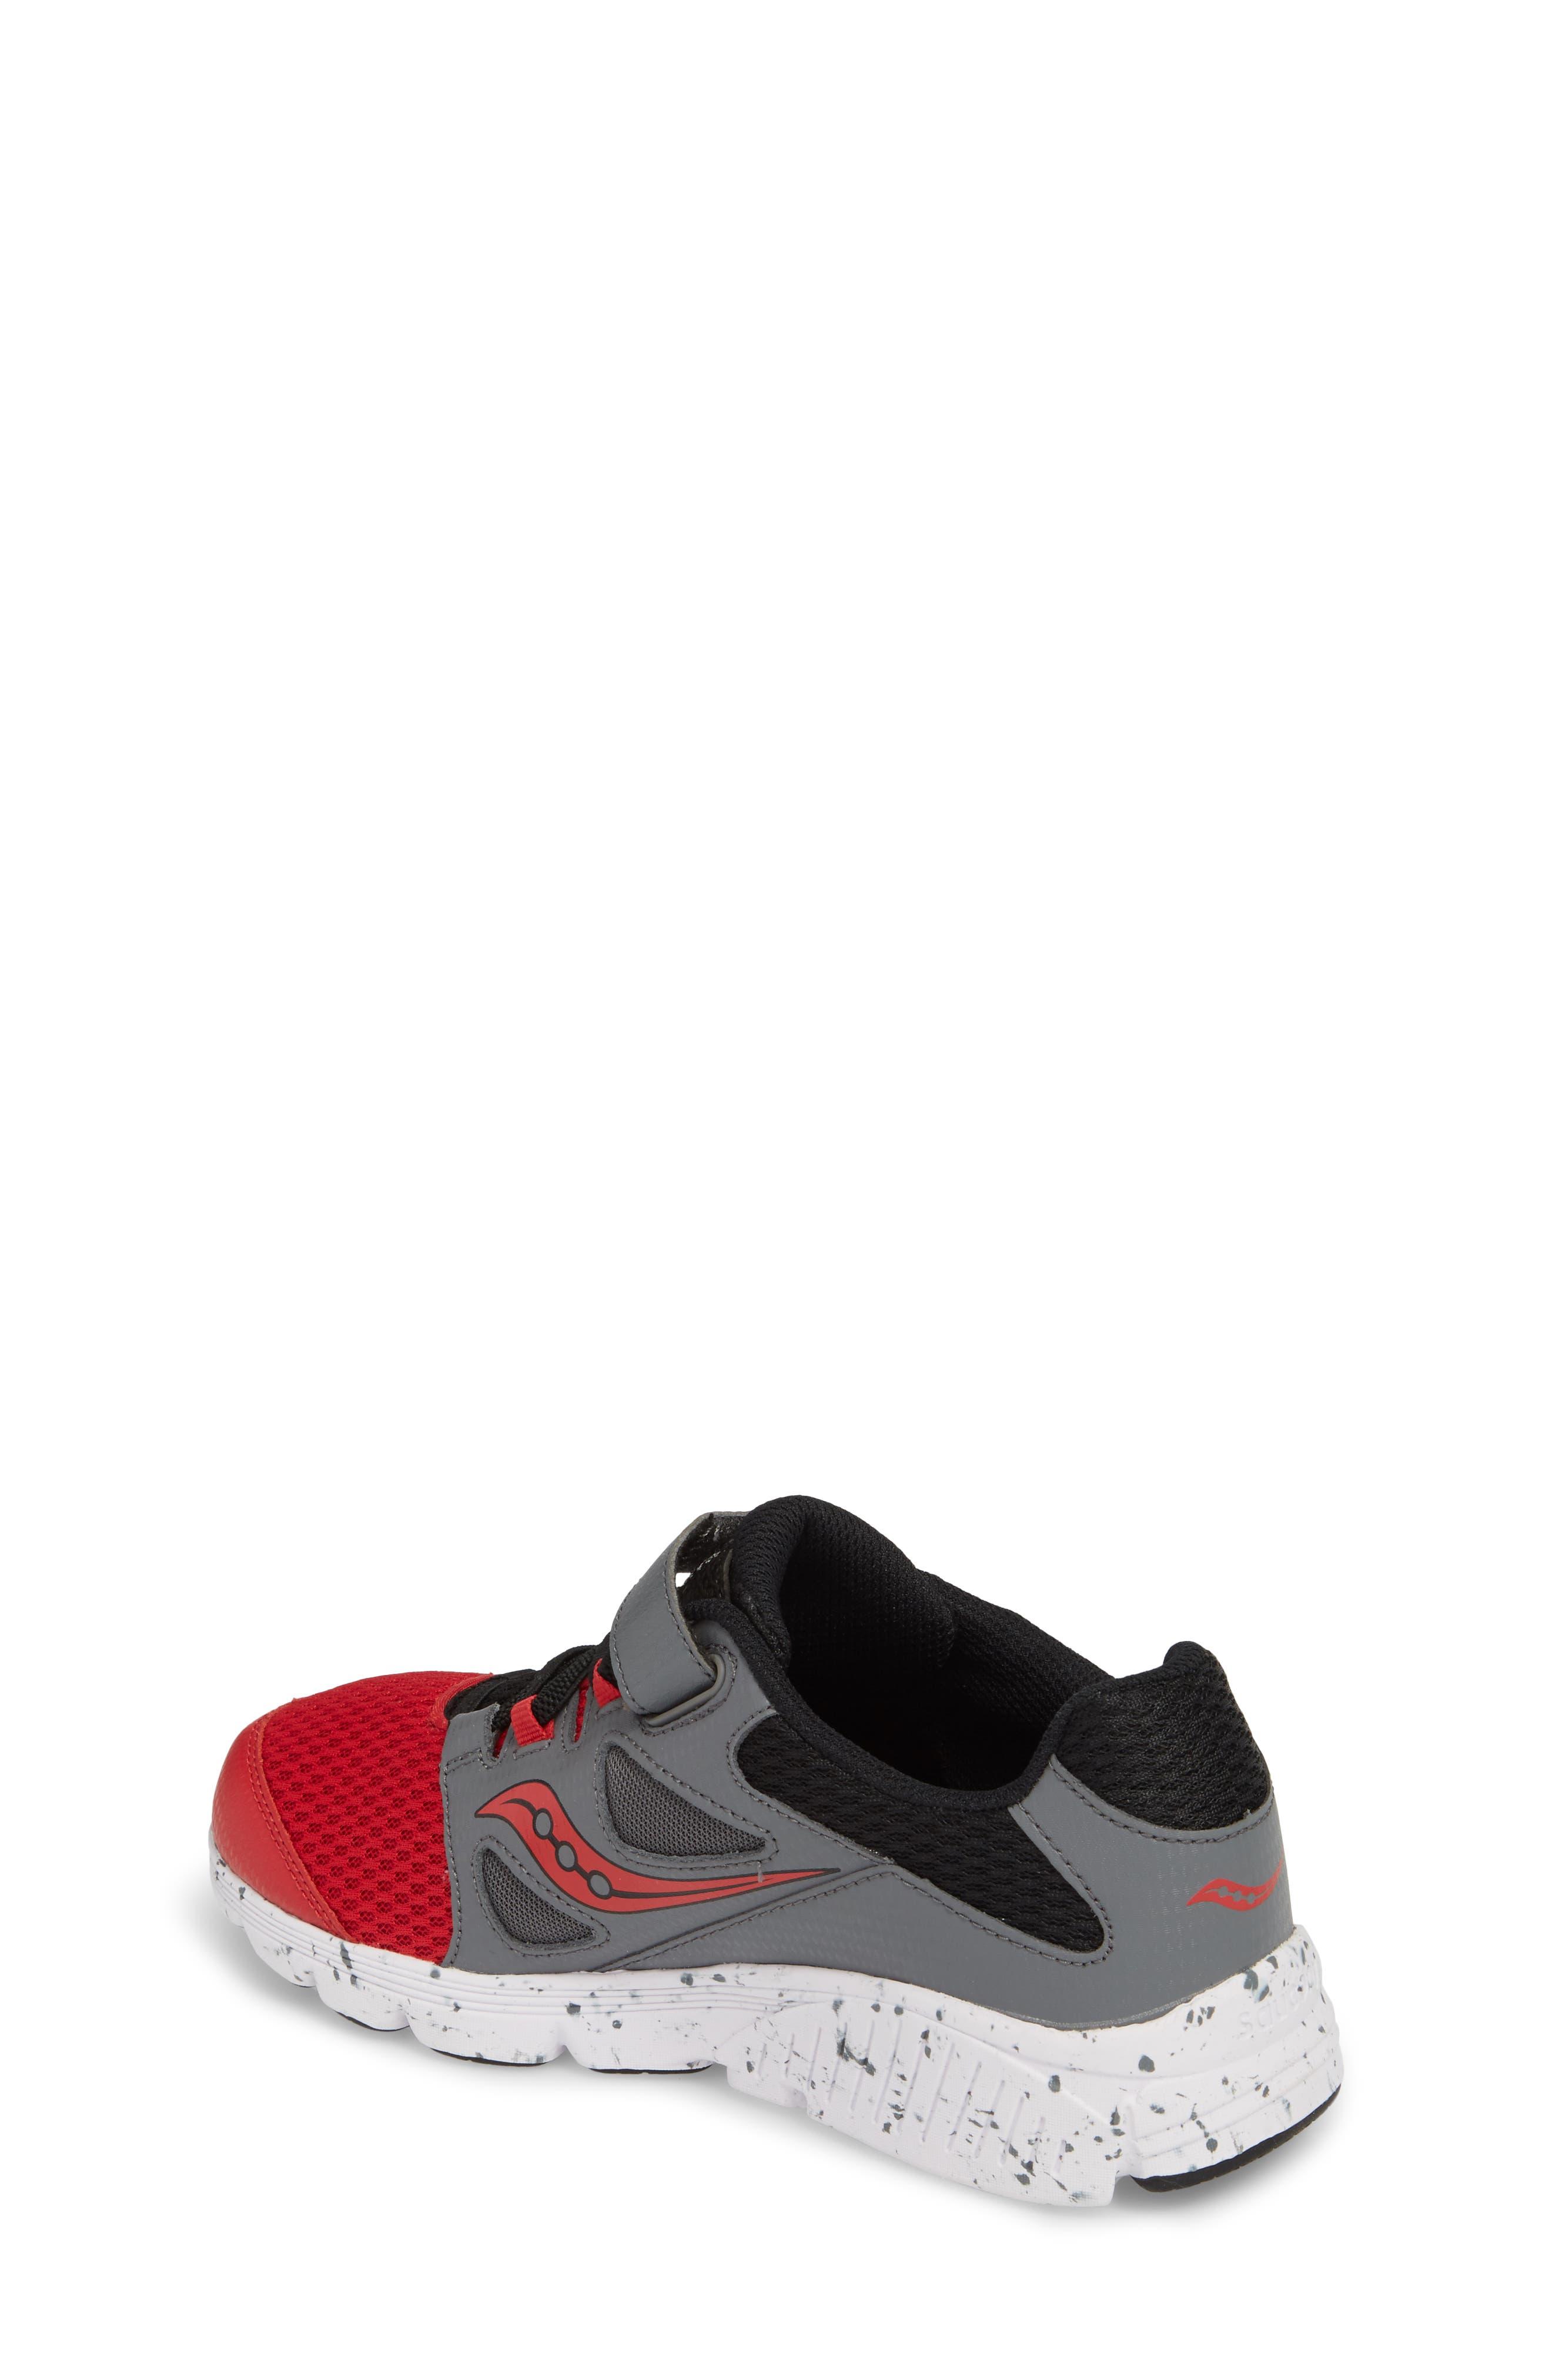 Kotaro 4 Sneaker,                             Alternate thumbnail 2, color,                             Red/ Grey